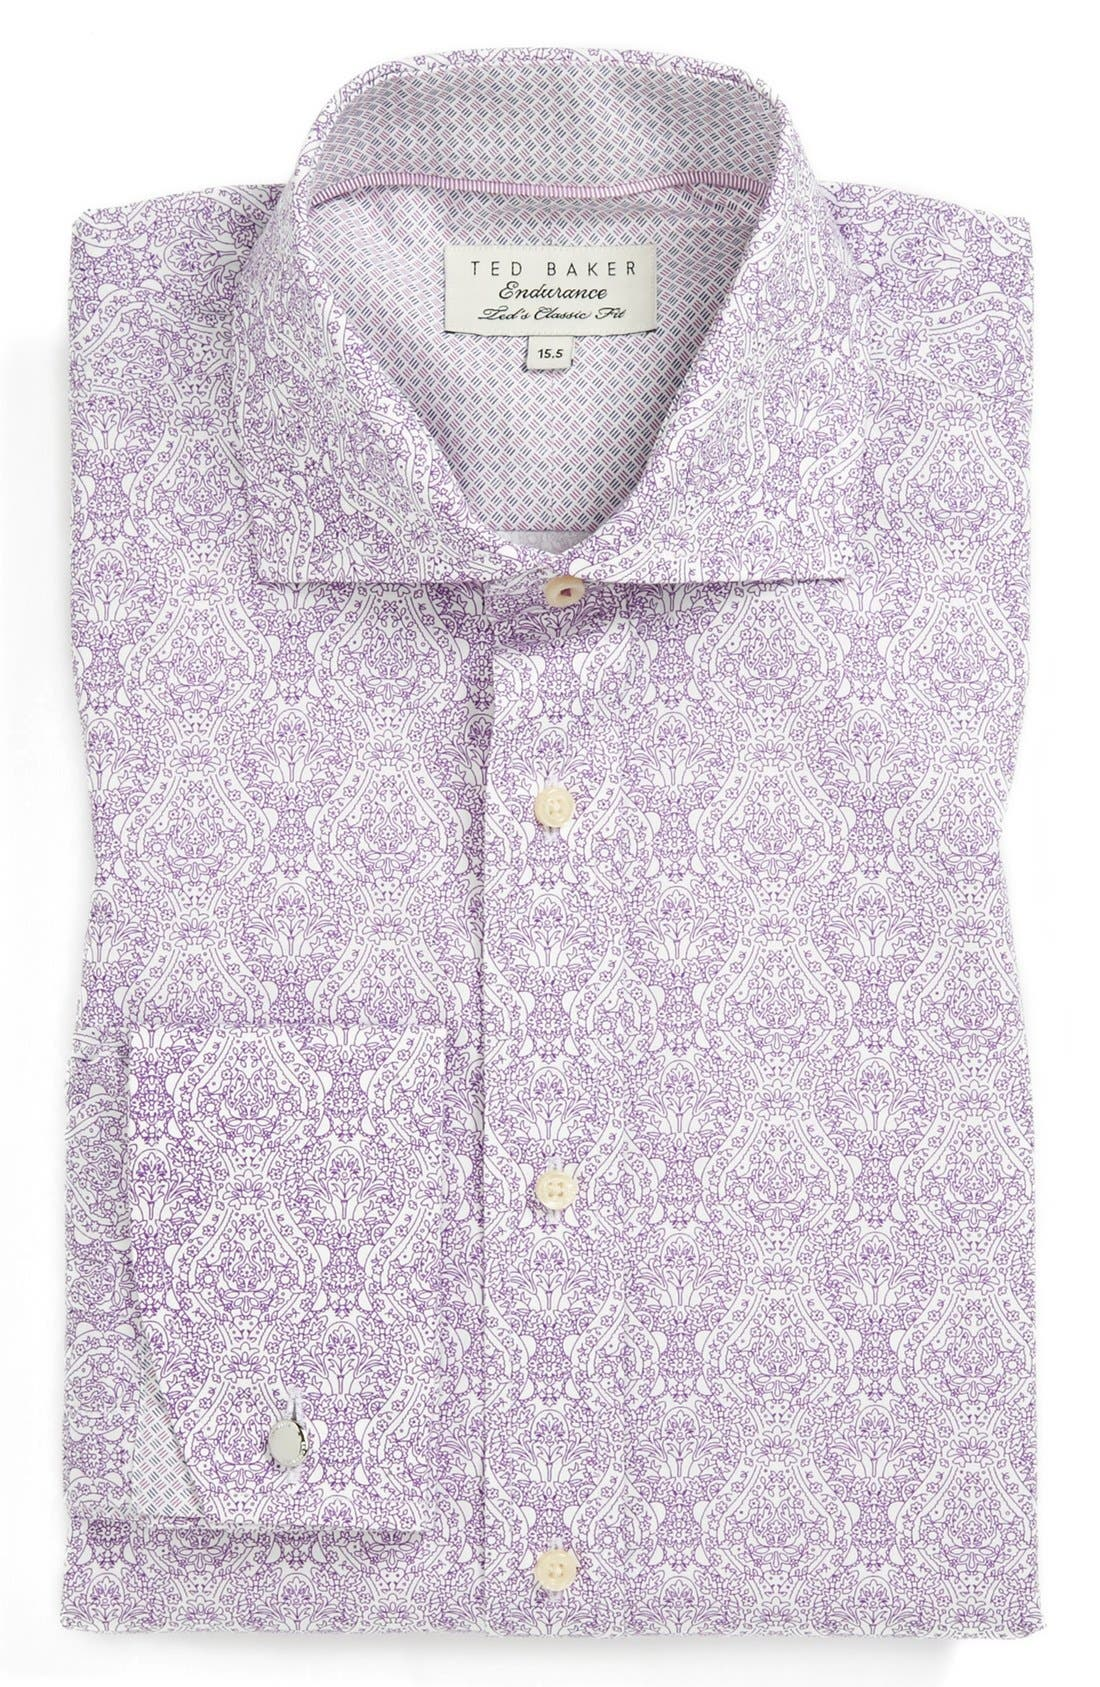 Main Image - Ted Baker London Extra Trim Fit Dress Shirt